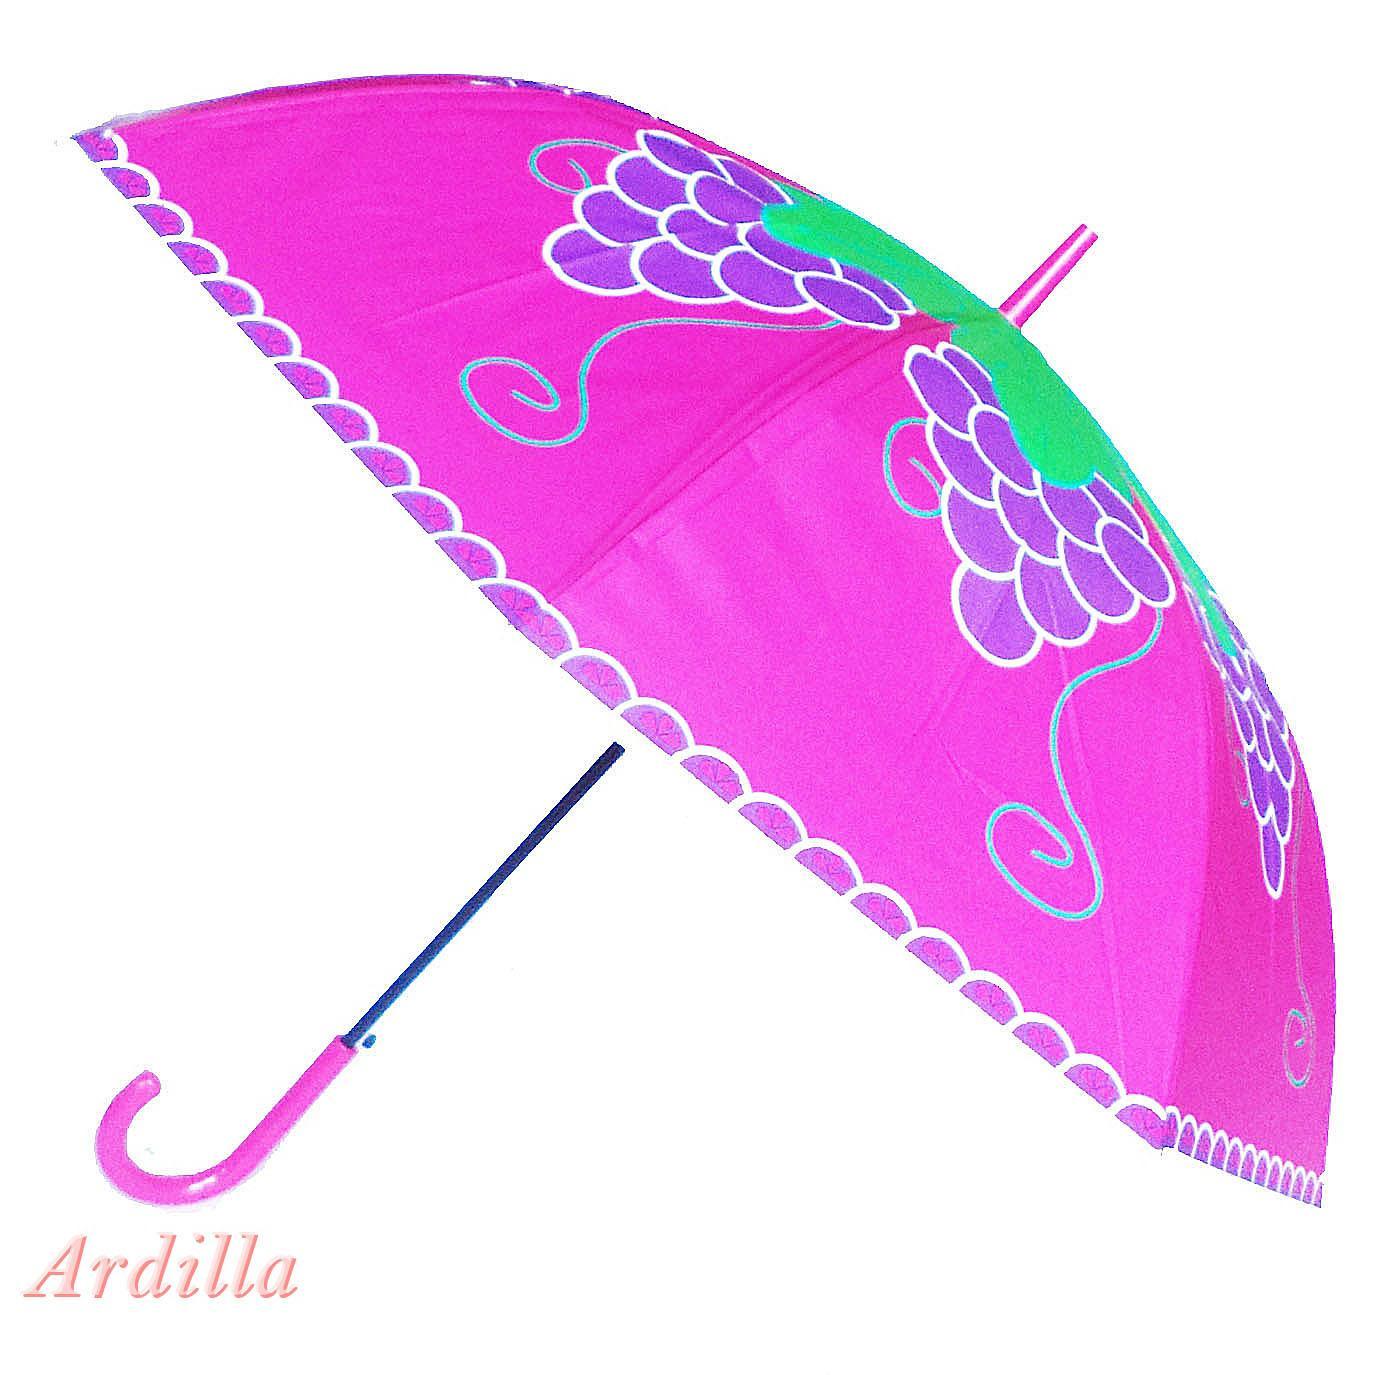 Ardilla Payung Besar Seri Buah / Payung Dewasa / Payung Motif Buah By Ardilla Shop.